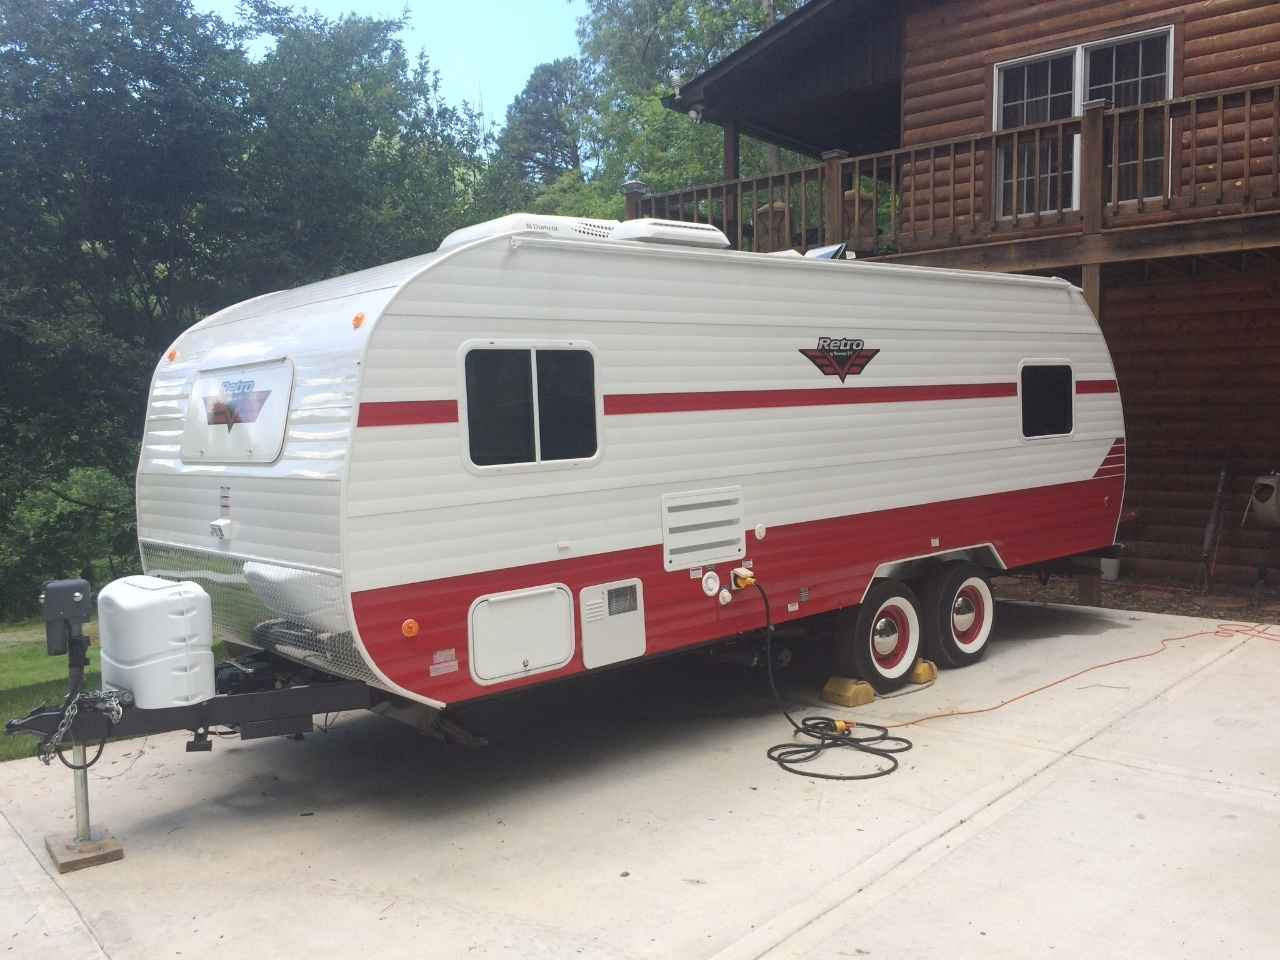 2017 used riverside rv retro 195 travel trailer in georgia ga